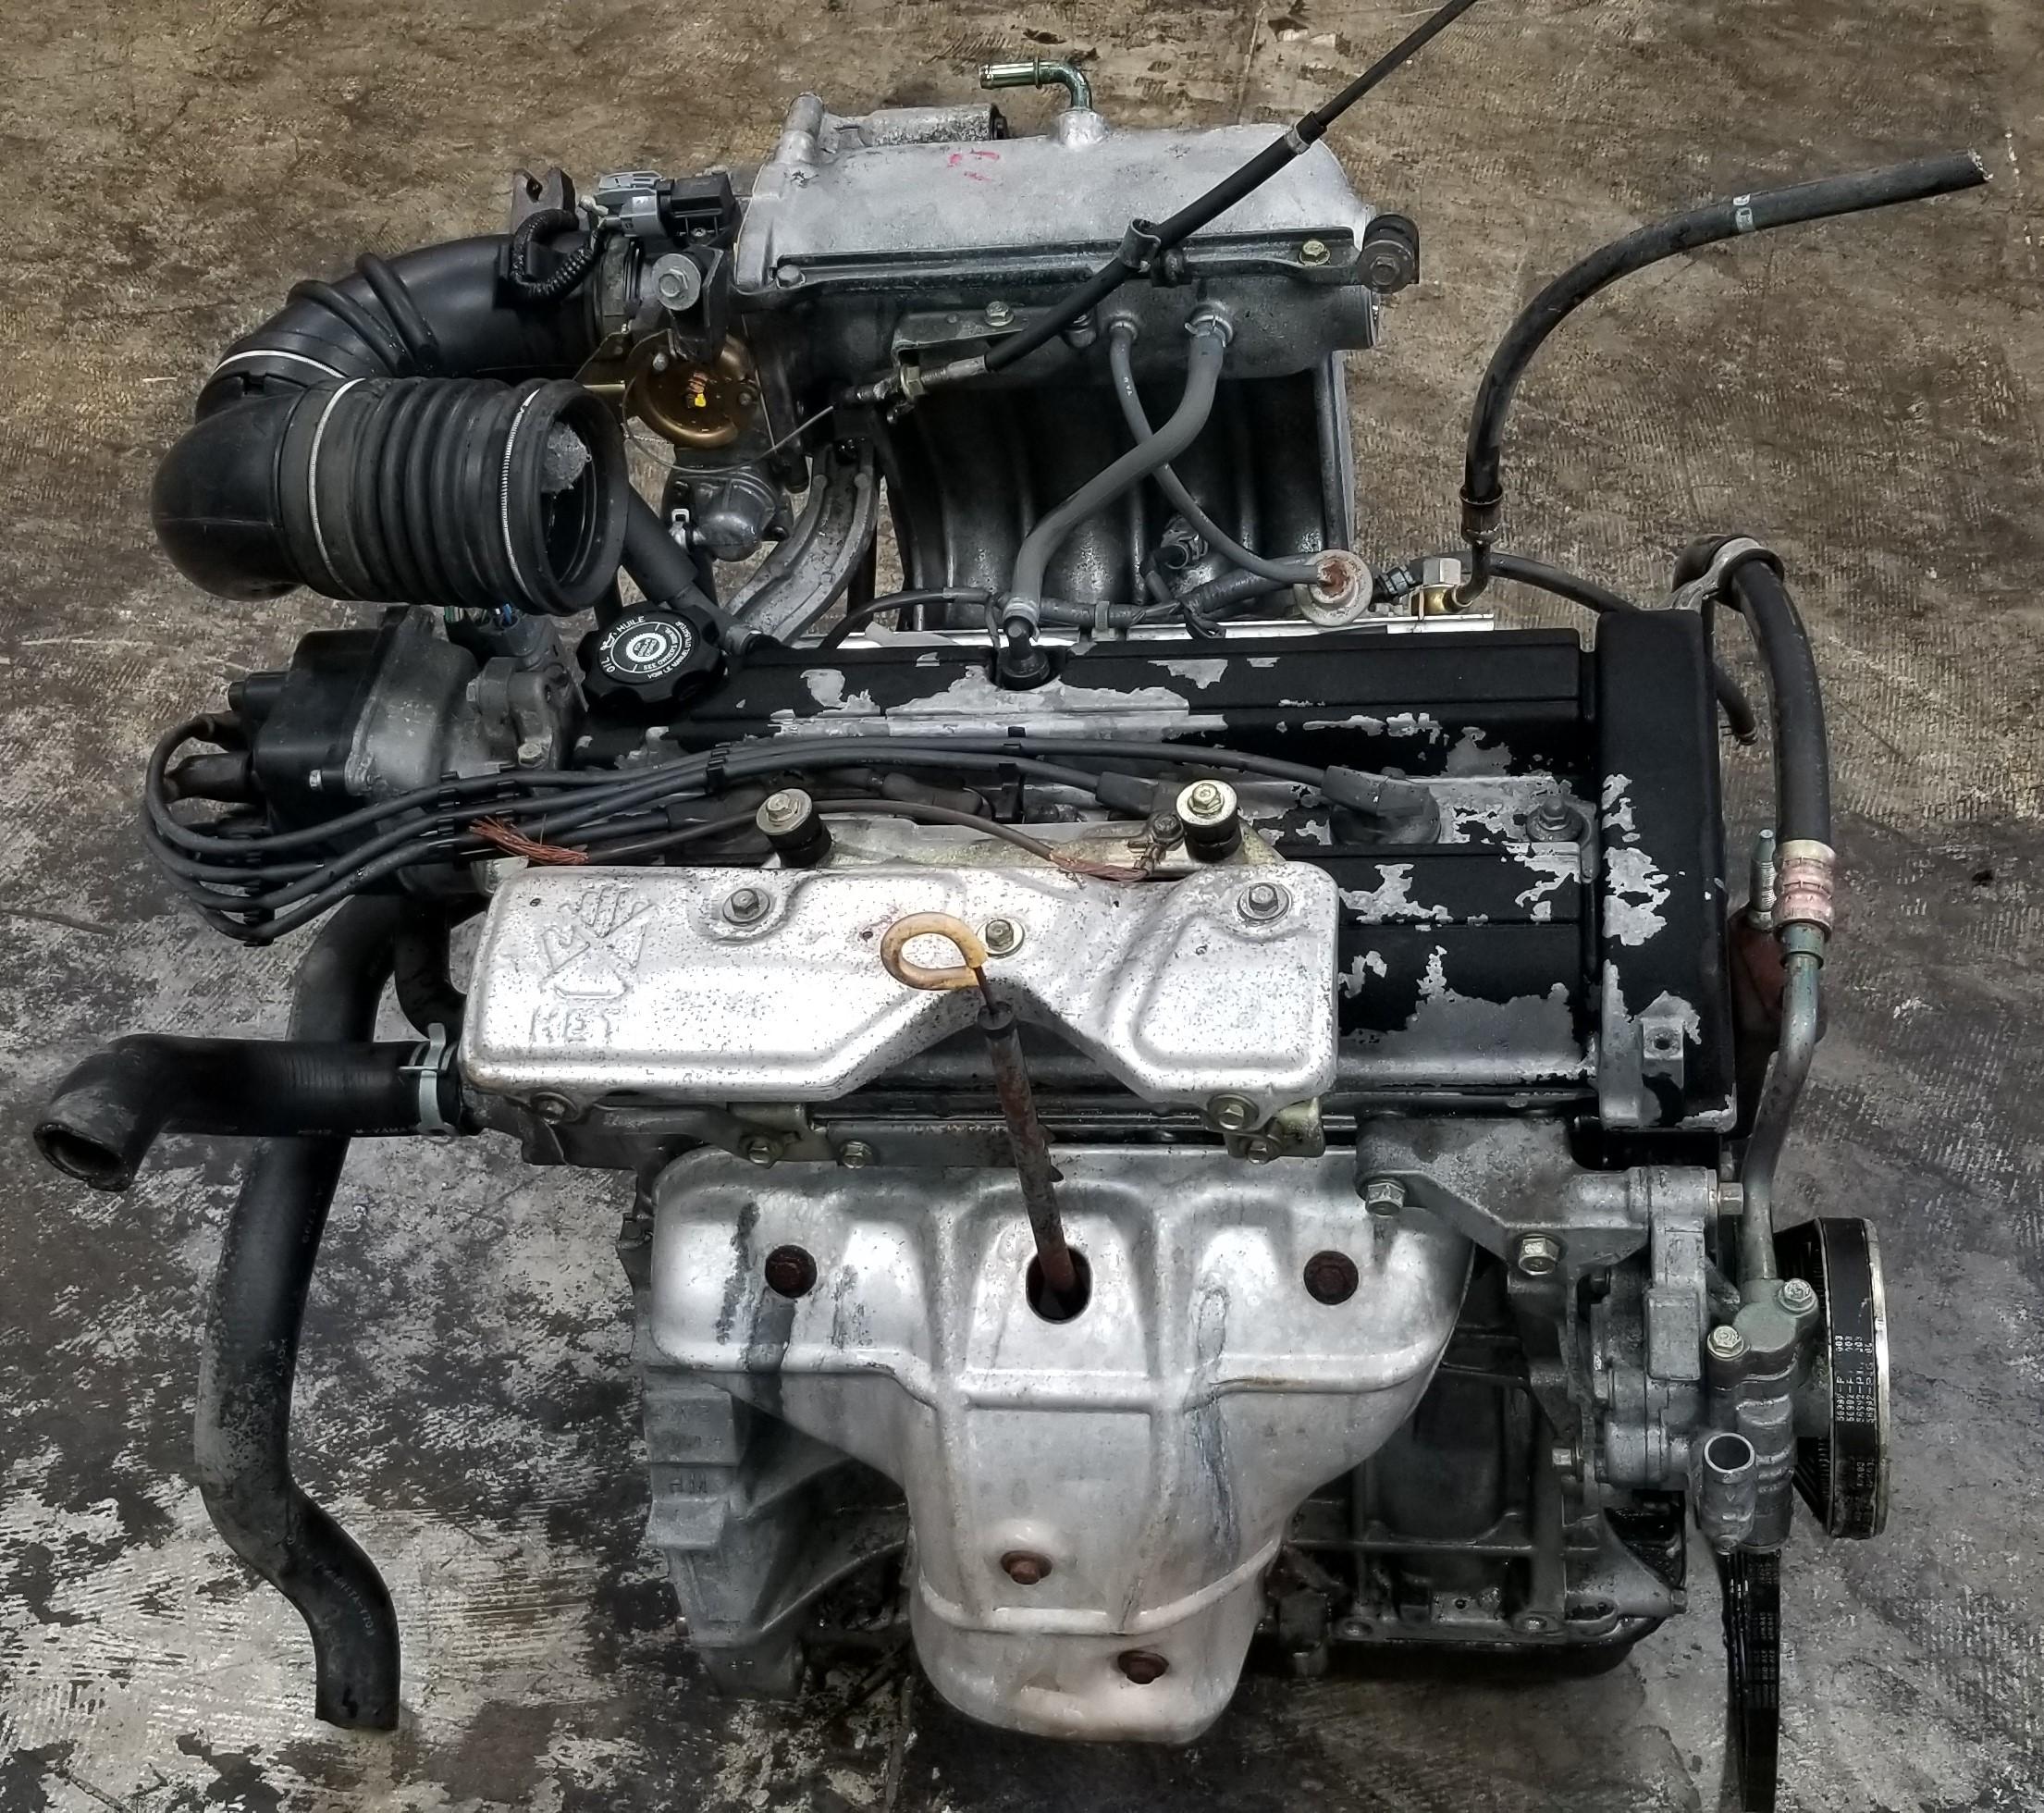 B20B 1997-1999 JDM Honda CRV Civic Integra B20 DOHC Engine